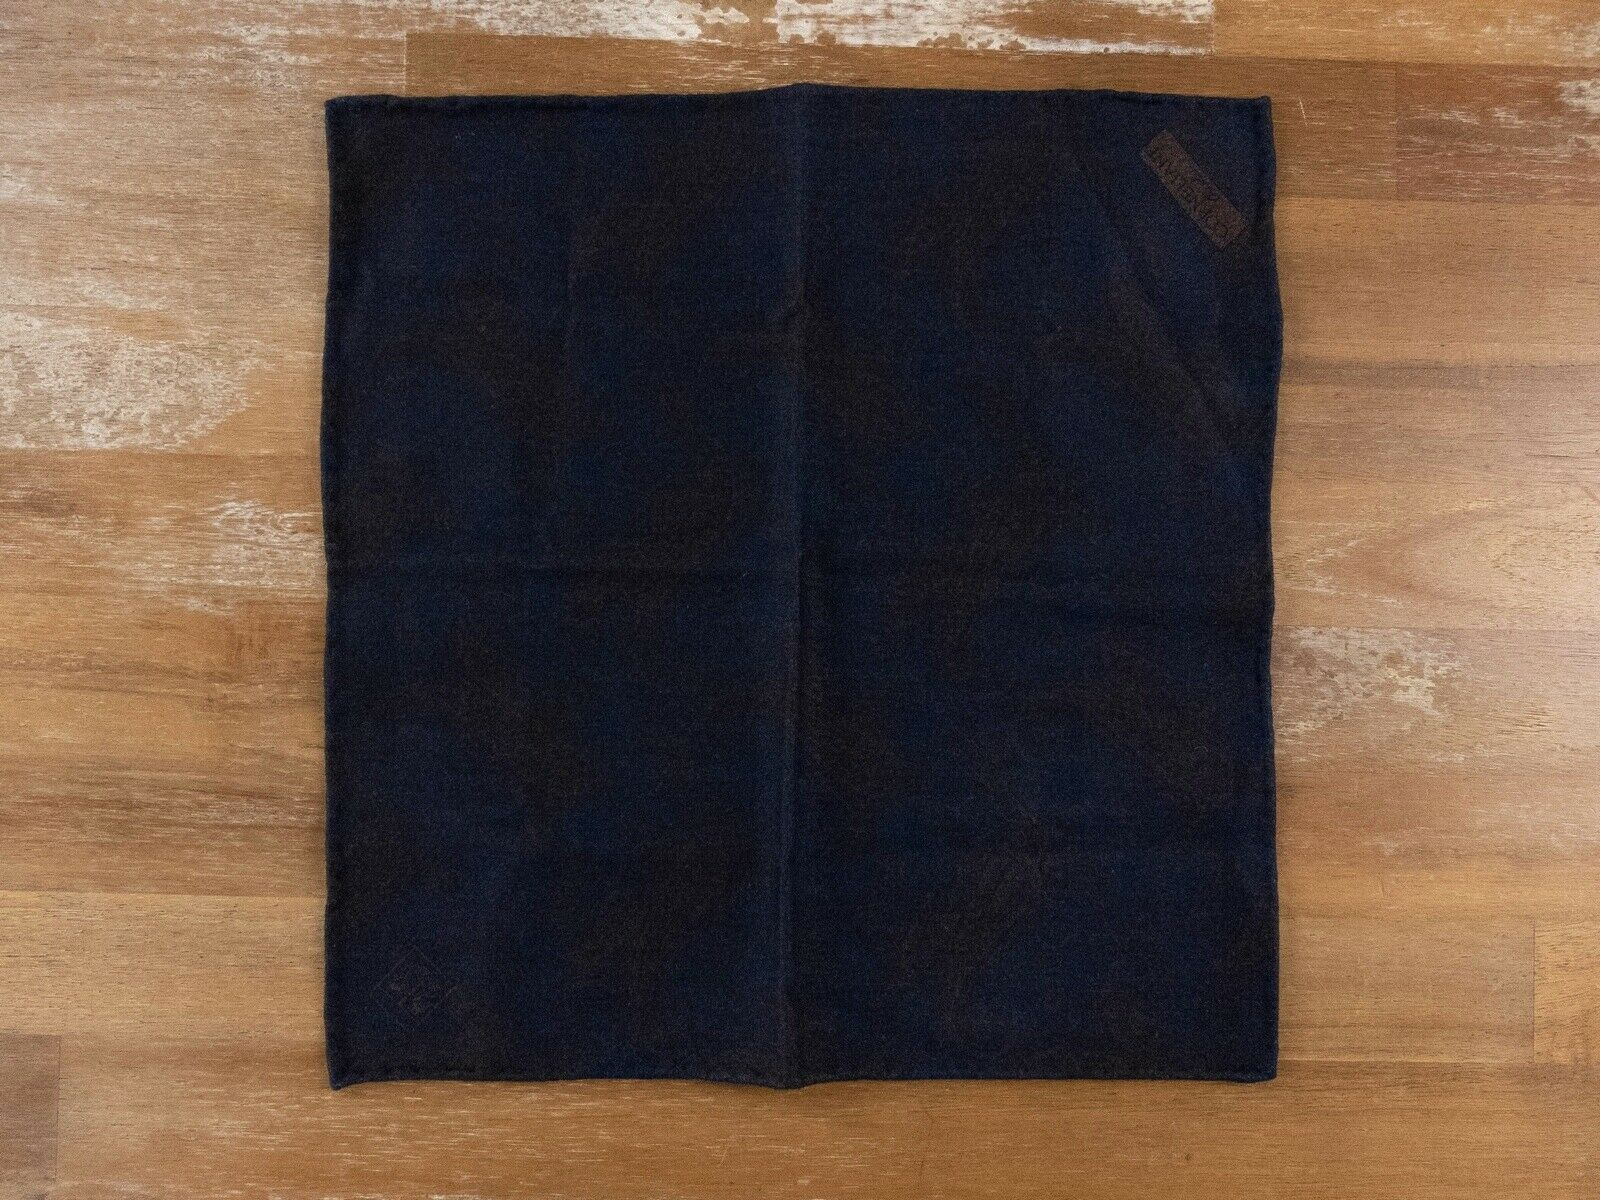 CORNELIANI brown blue wool reversible pocket square authentic